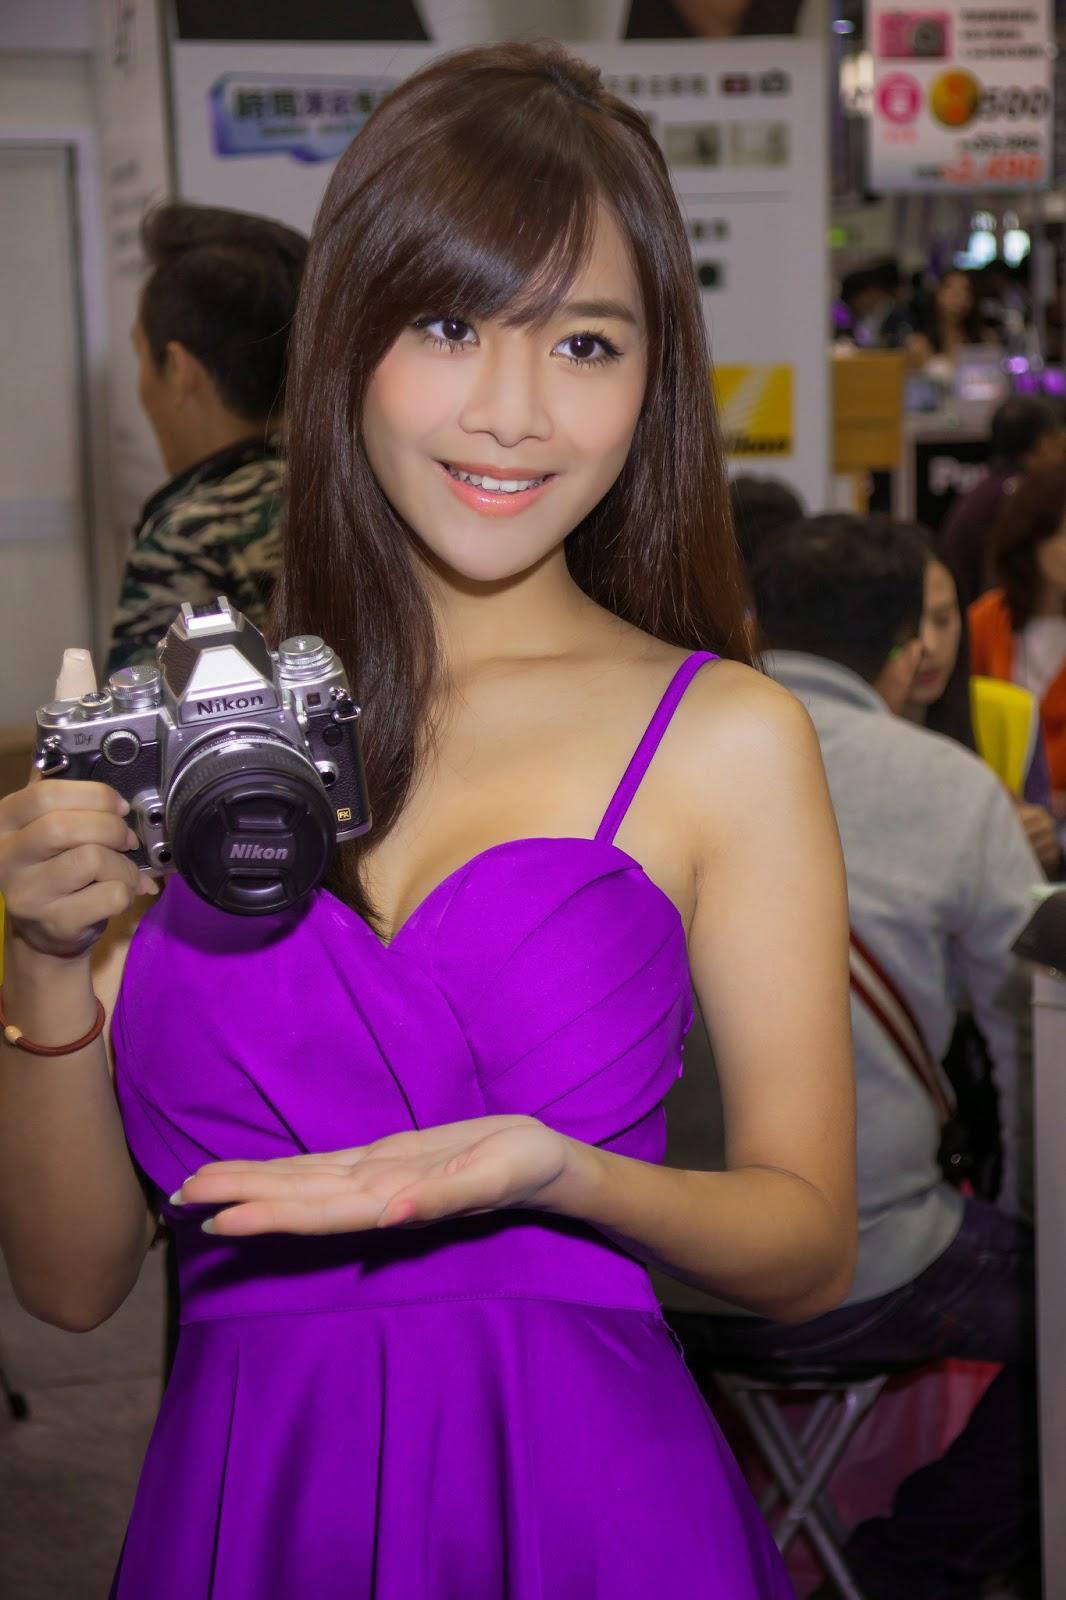 Super Sexy Asian Bikini Models At Taipei Mid Year Auto -2318